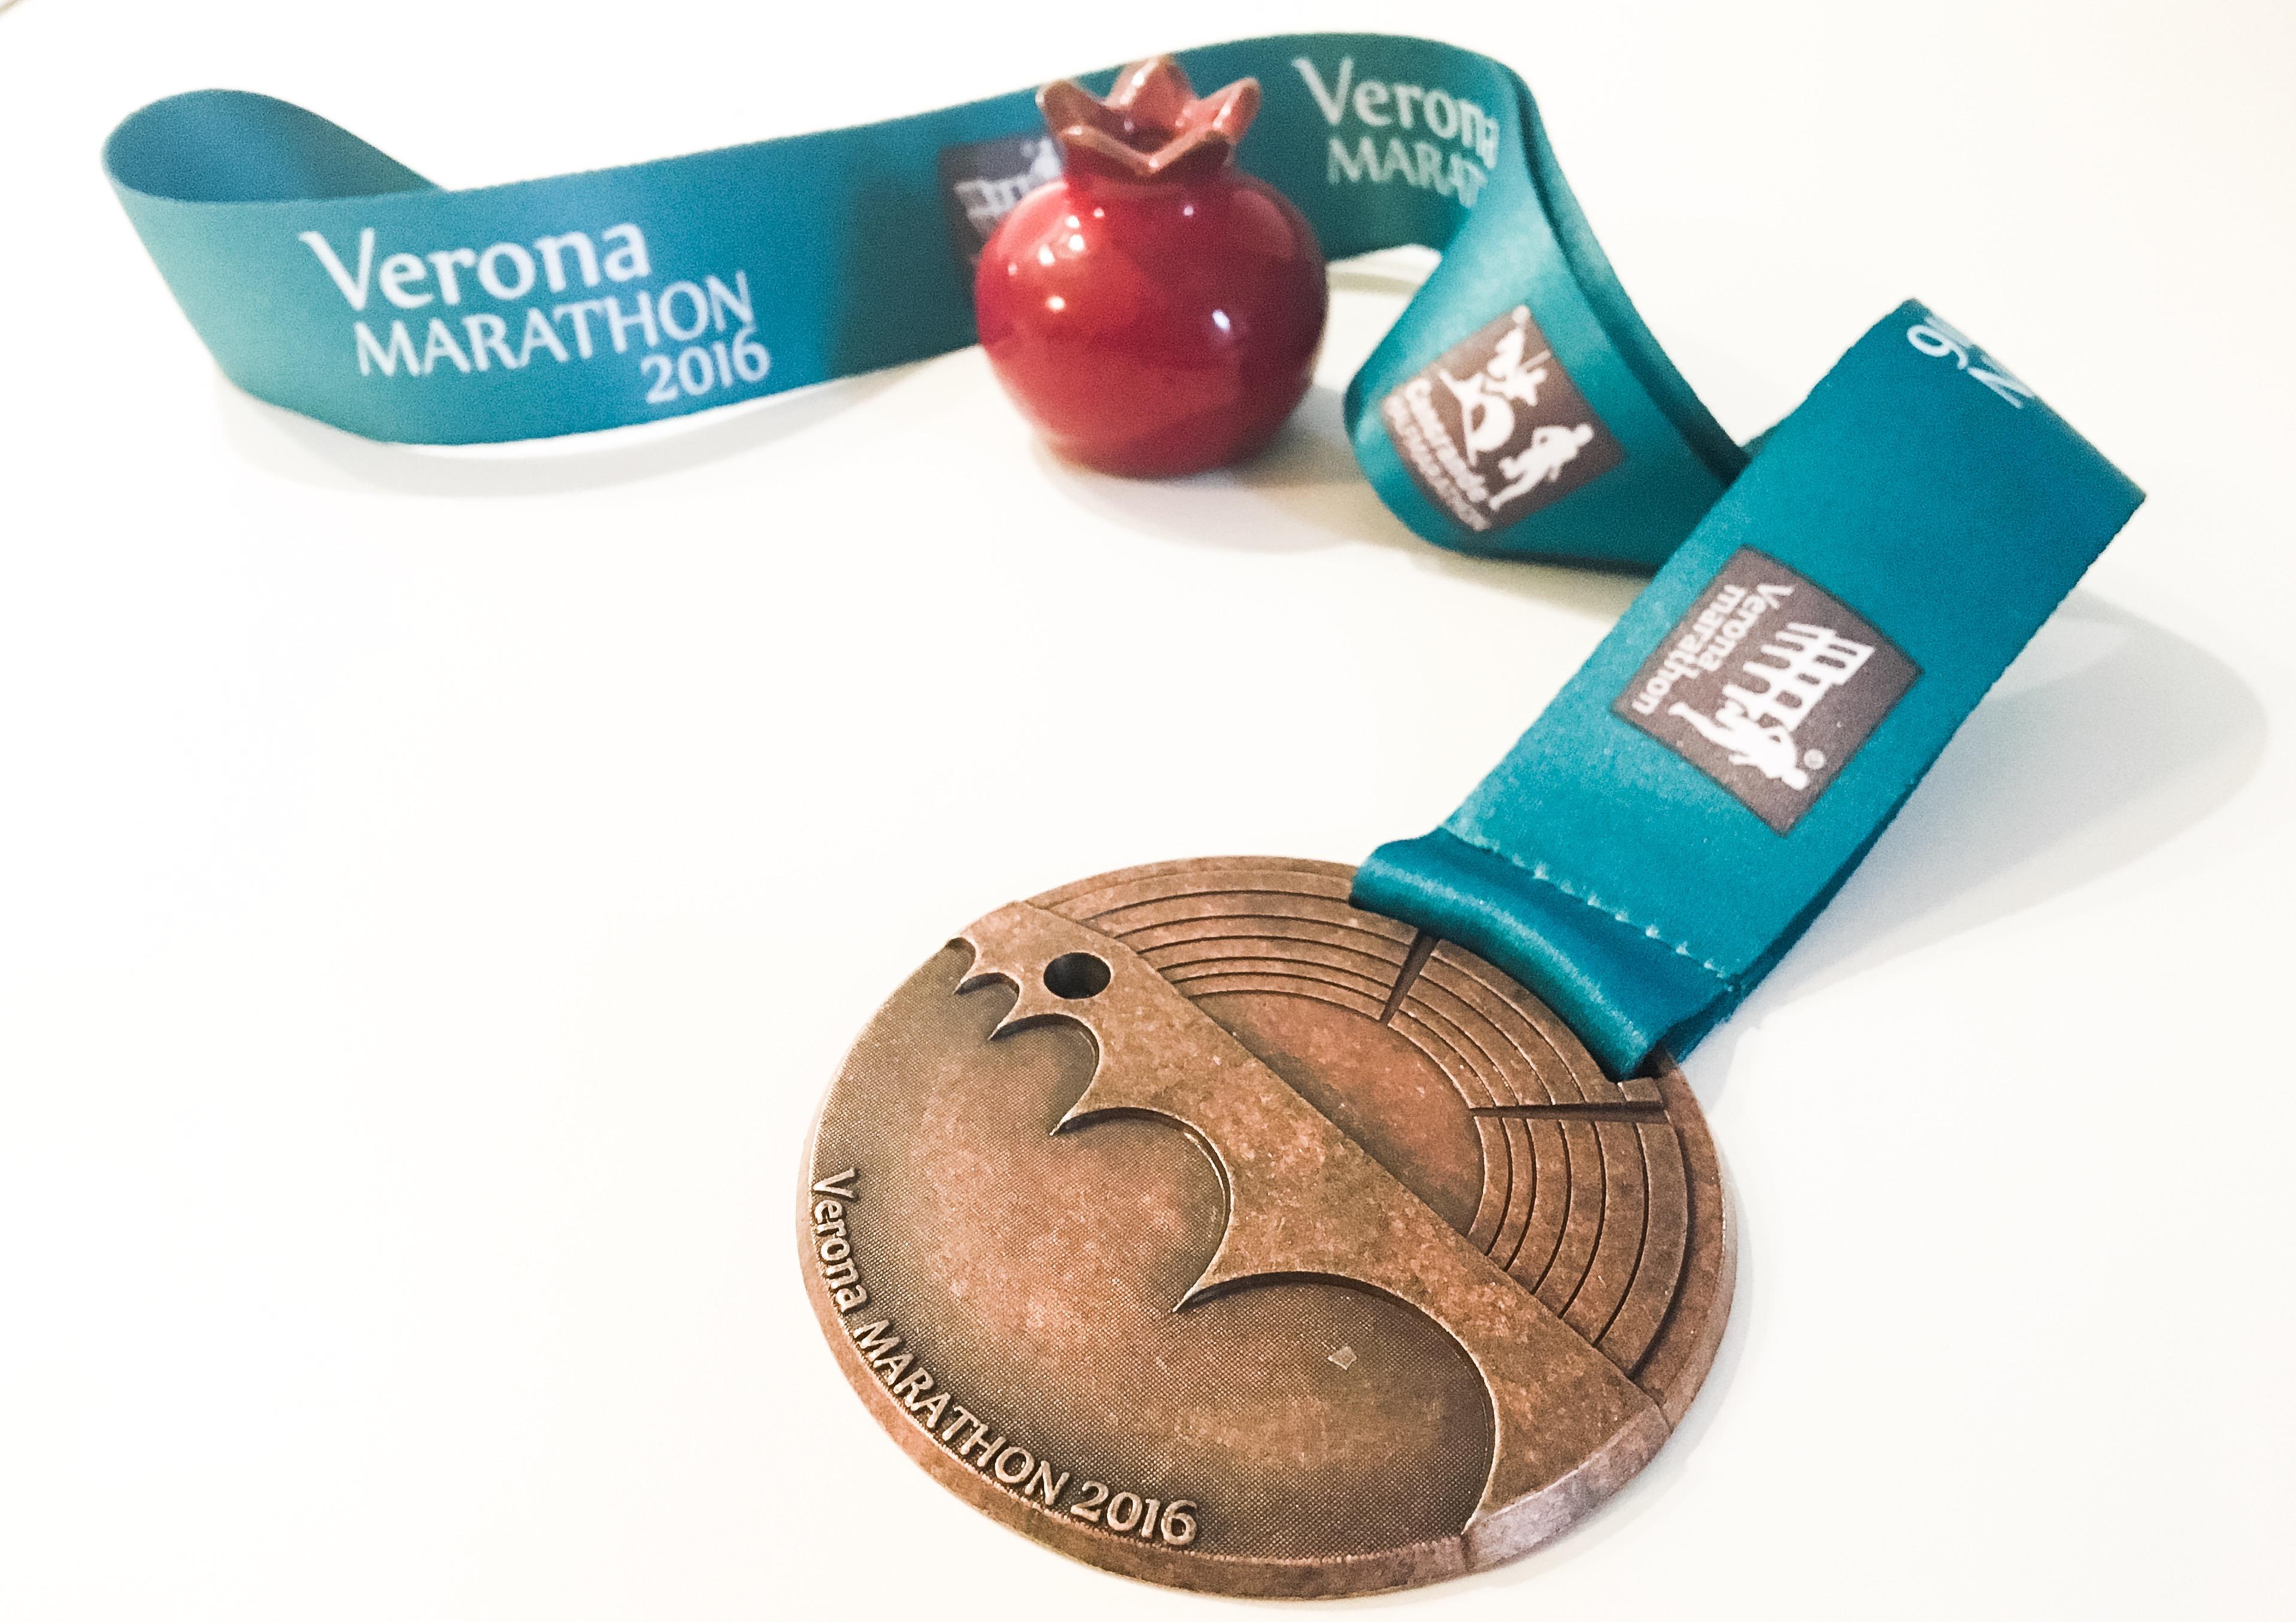 La Maratona è una storia d'amore: Verona Marathon